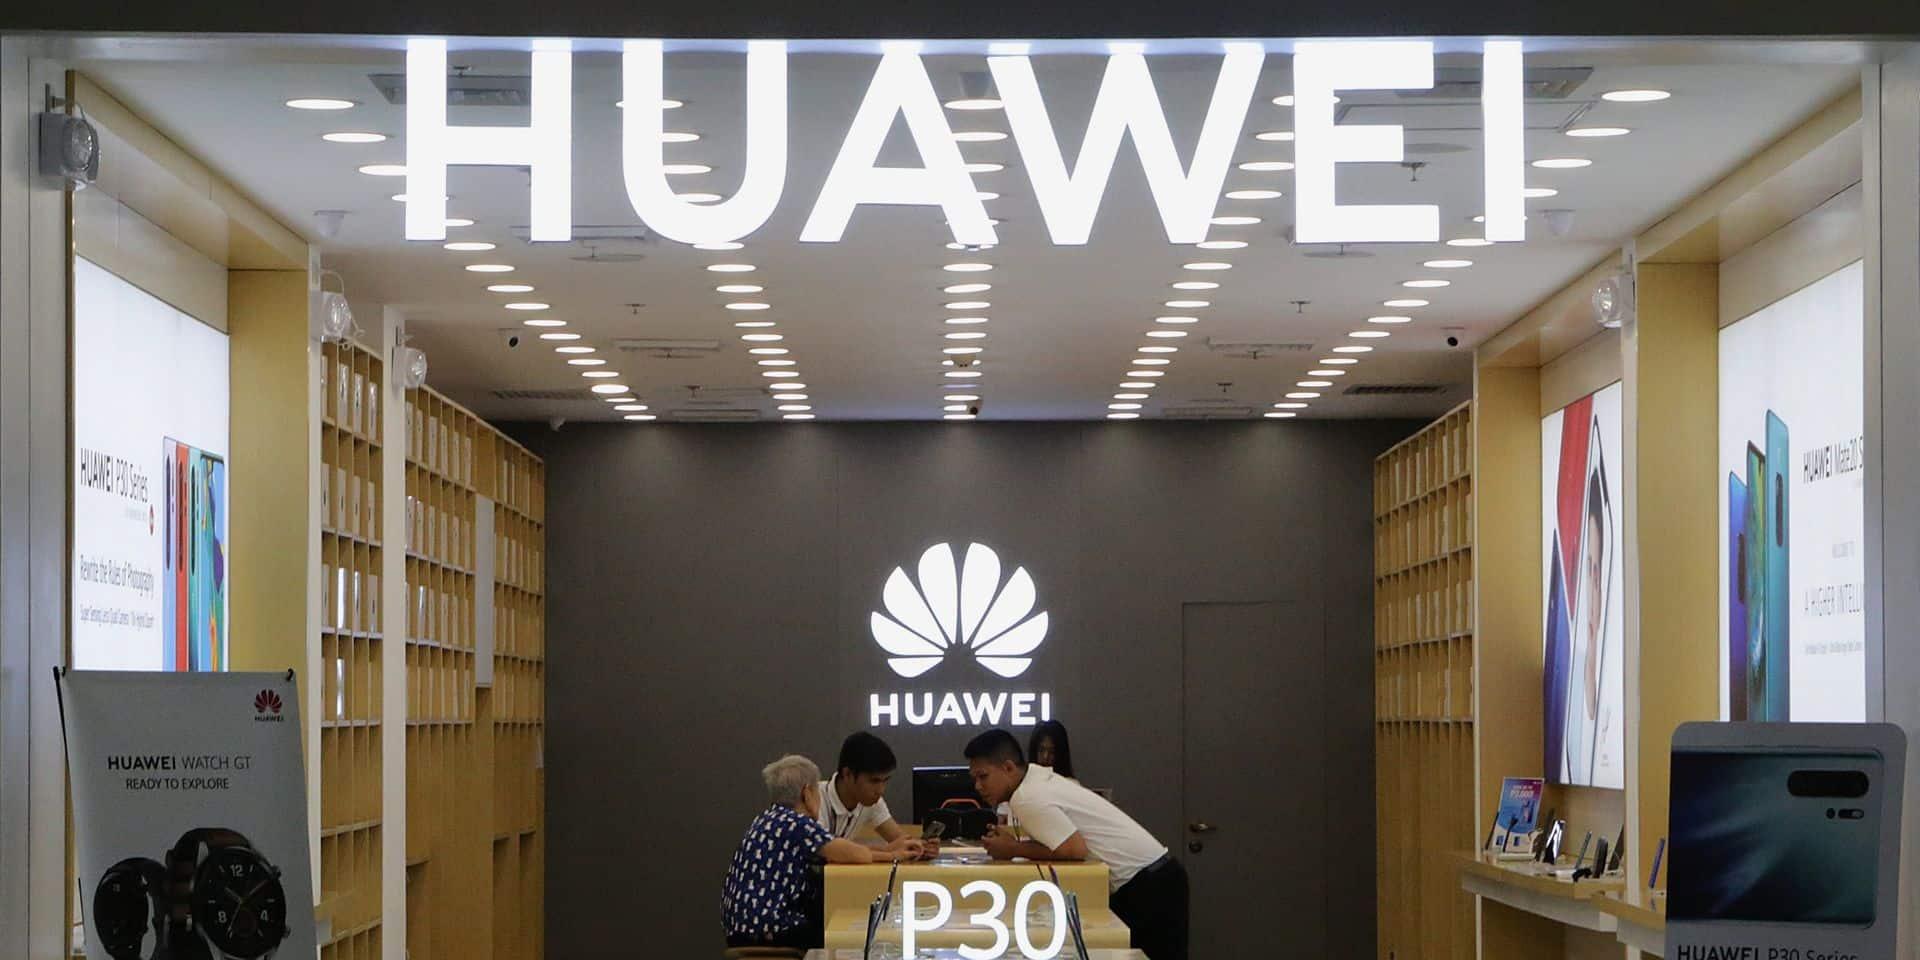 Huawei, une marque bientôt persona non grata en Europe ?